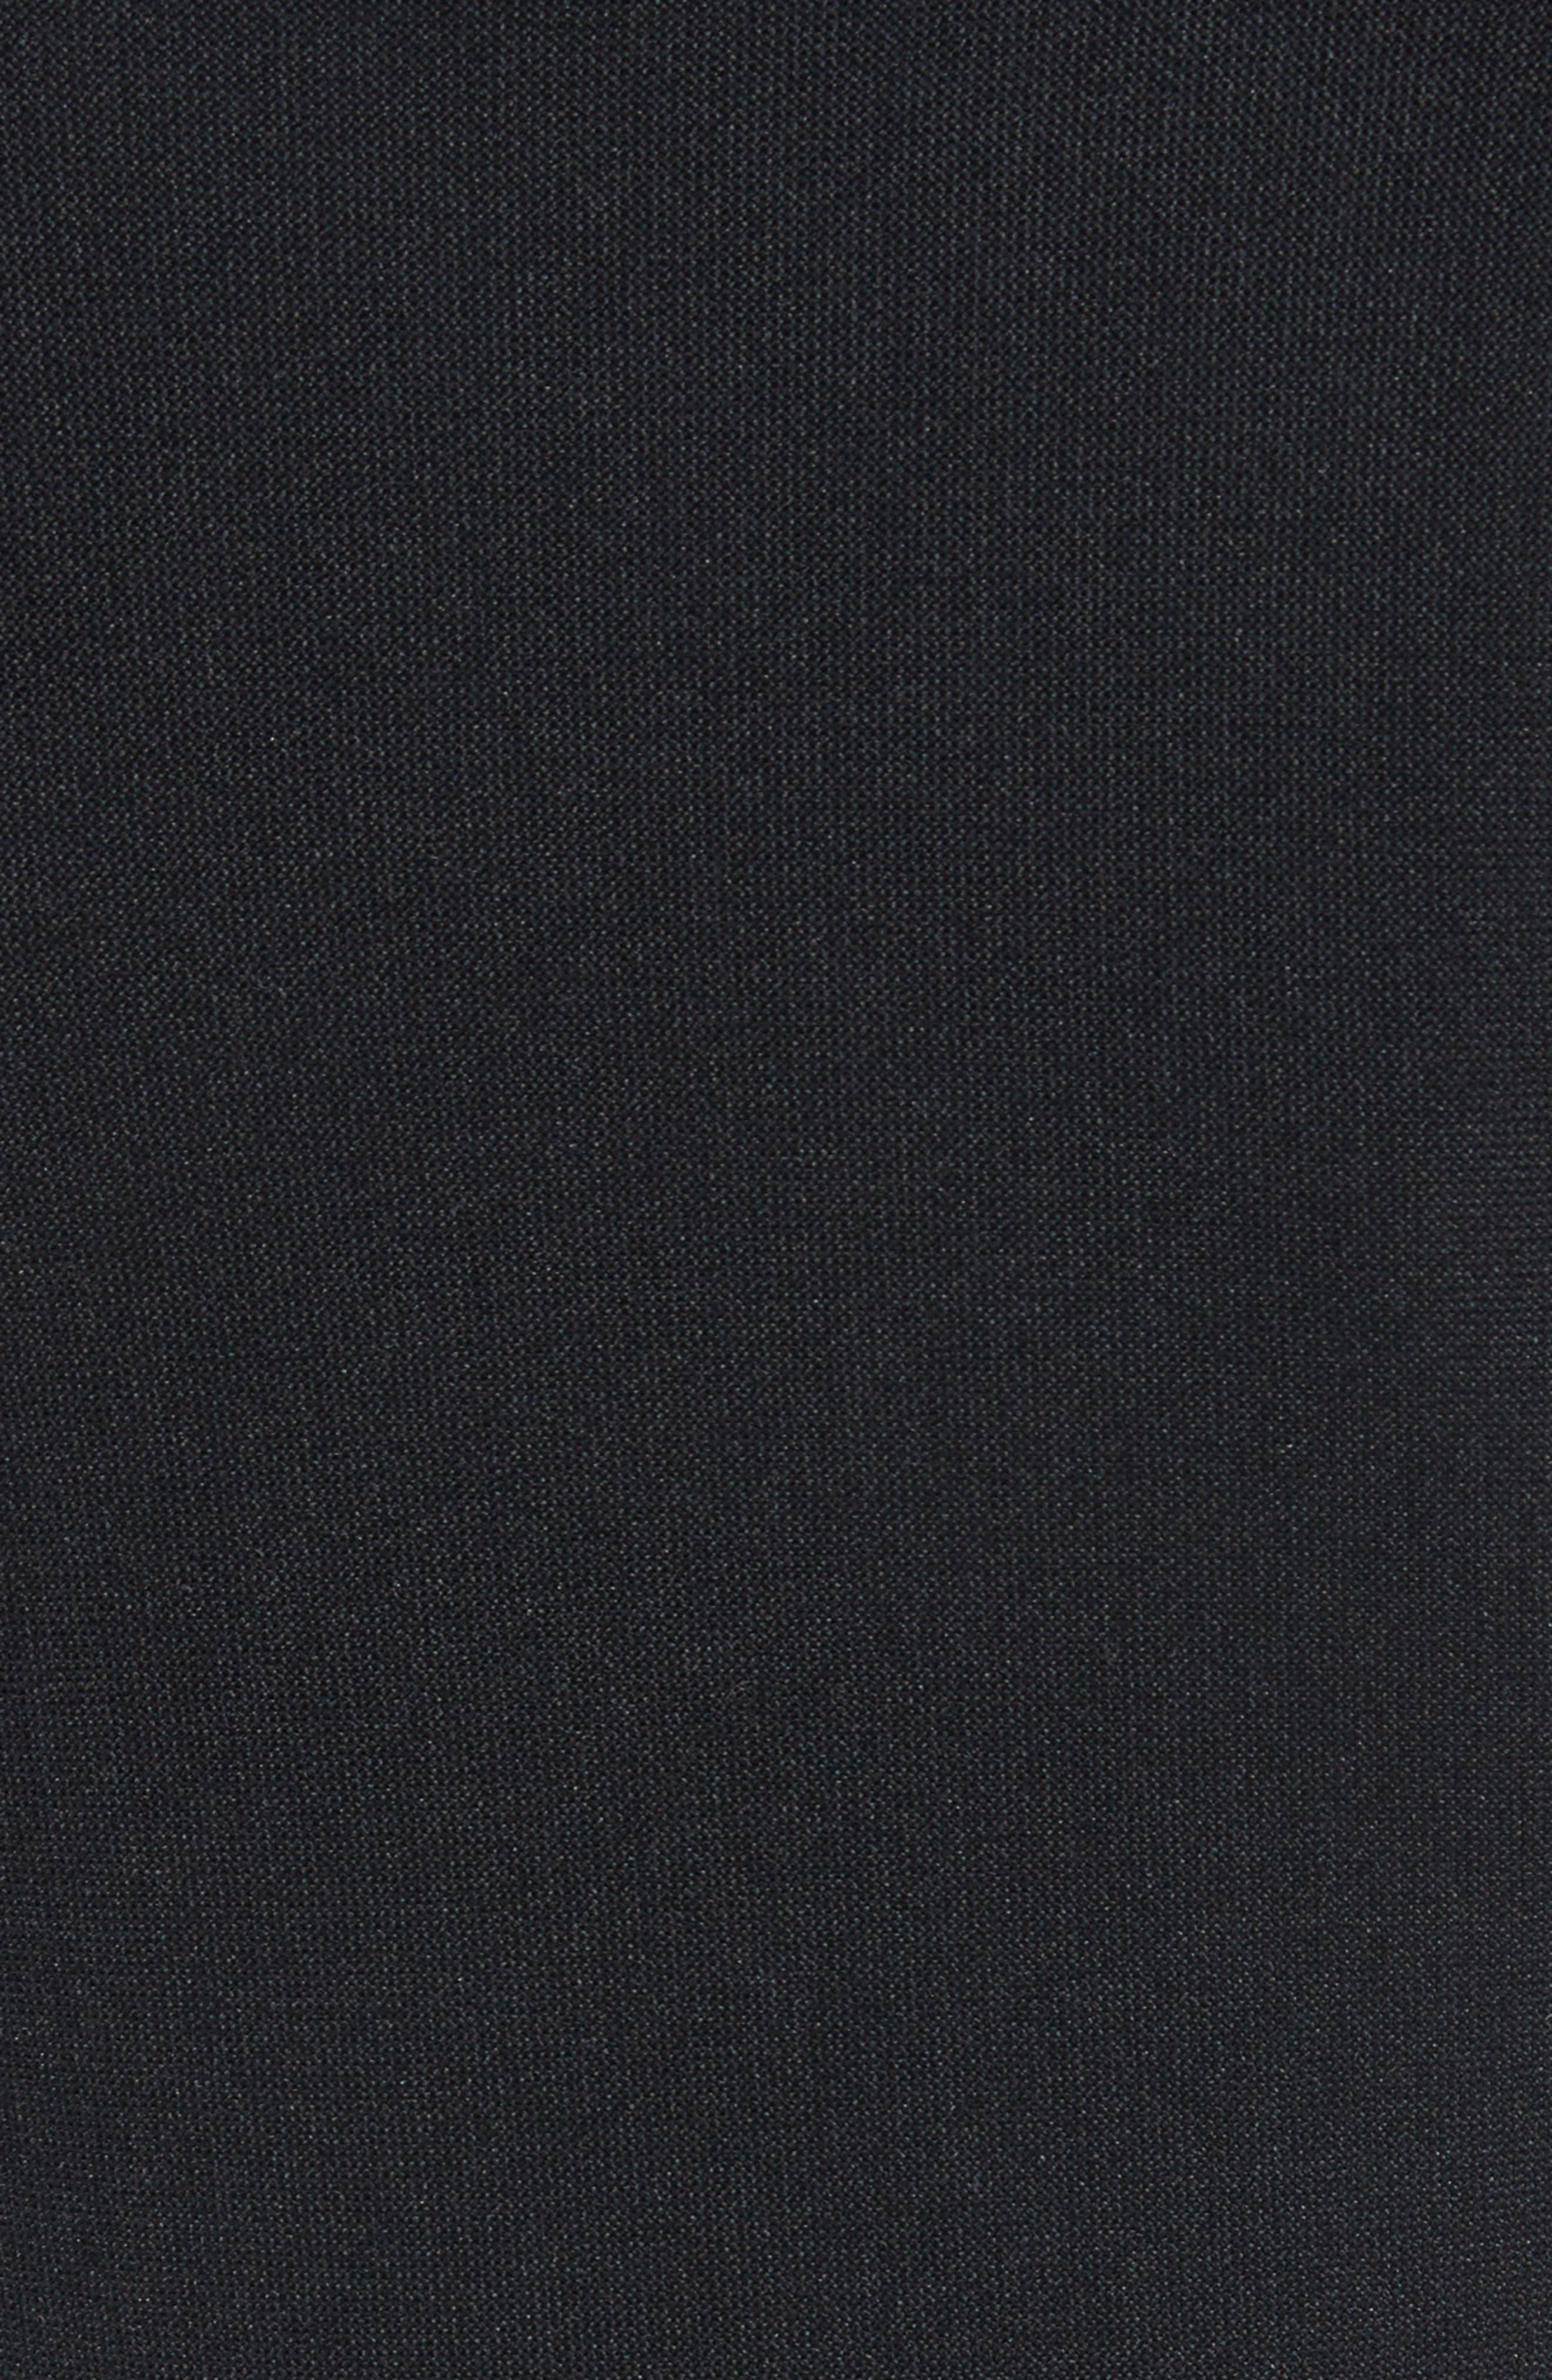 One-Shoulder Ruffle Dress,                             Alternate thumbnail 5, color,